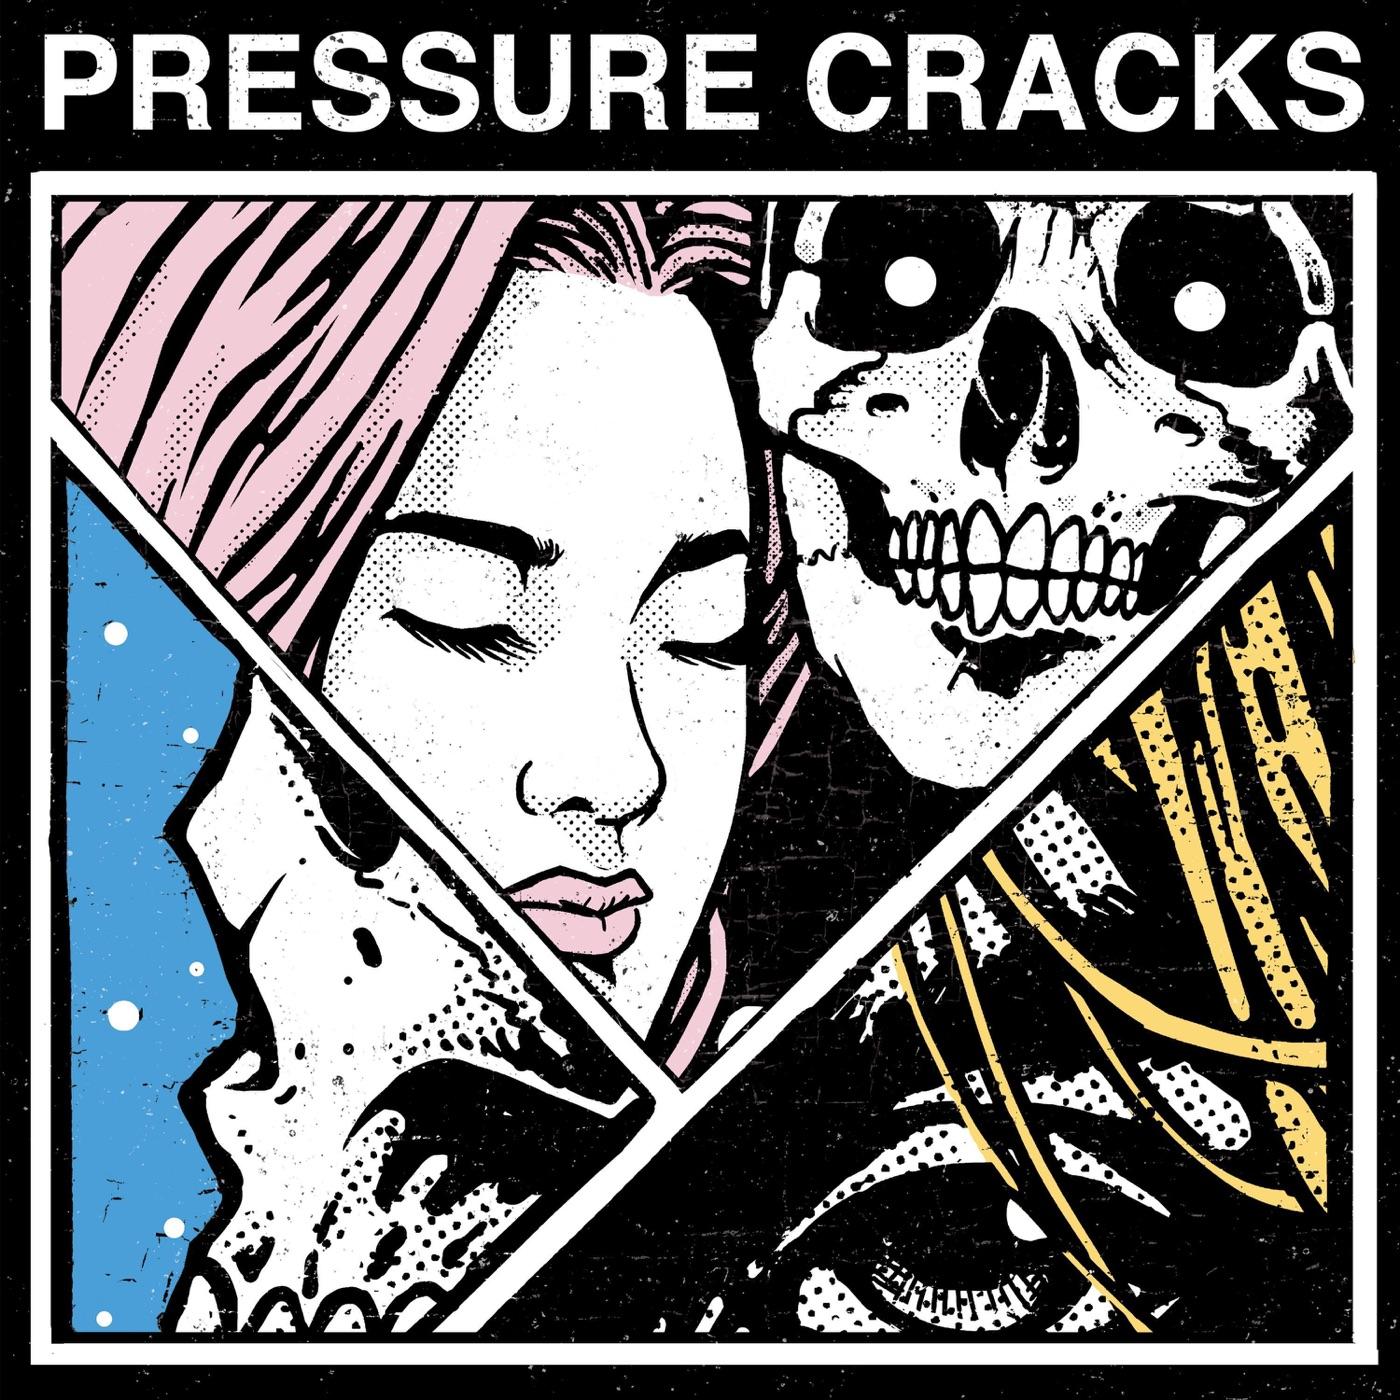 Pressure Cracks - Pressure Cracks [EP] (2018)